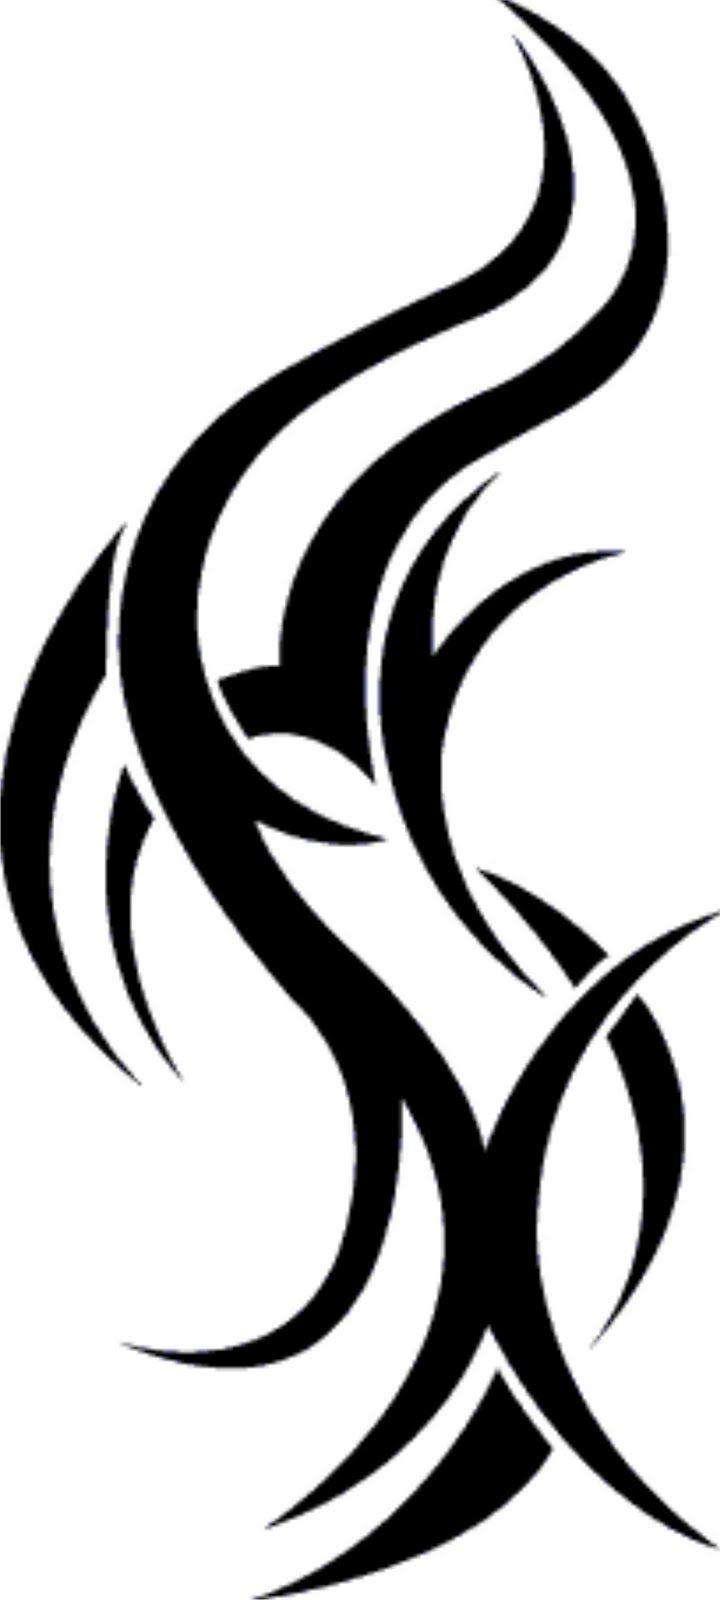 4c40e891d81ad9f9a60fe077918a990d small tribal tattoos polynesian tribal tattoos